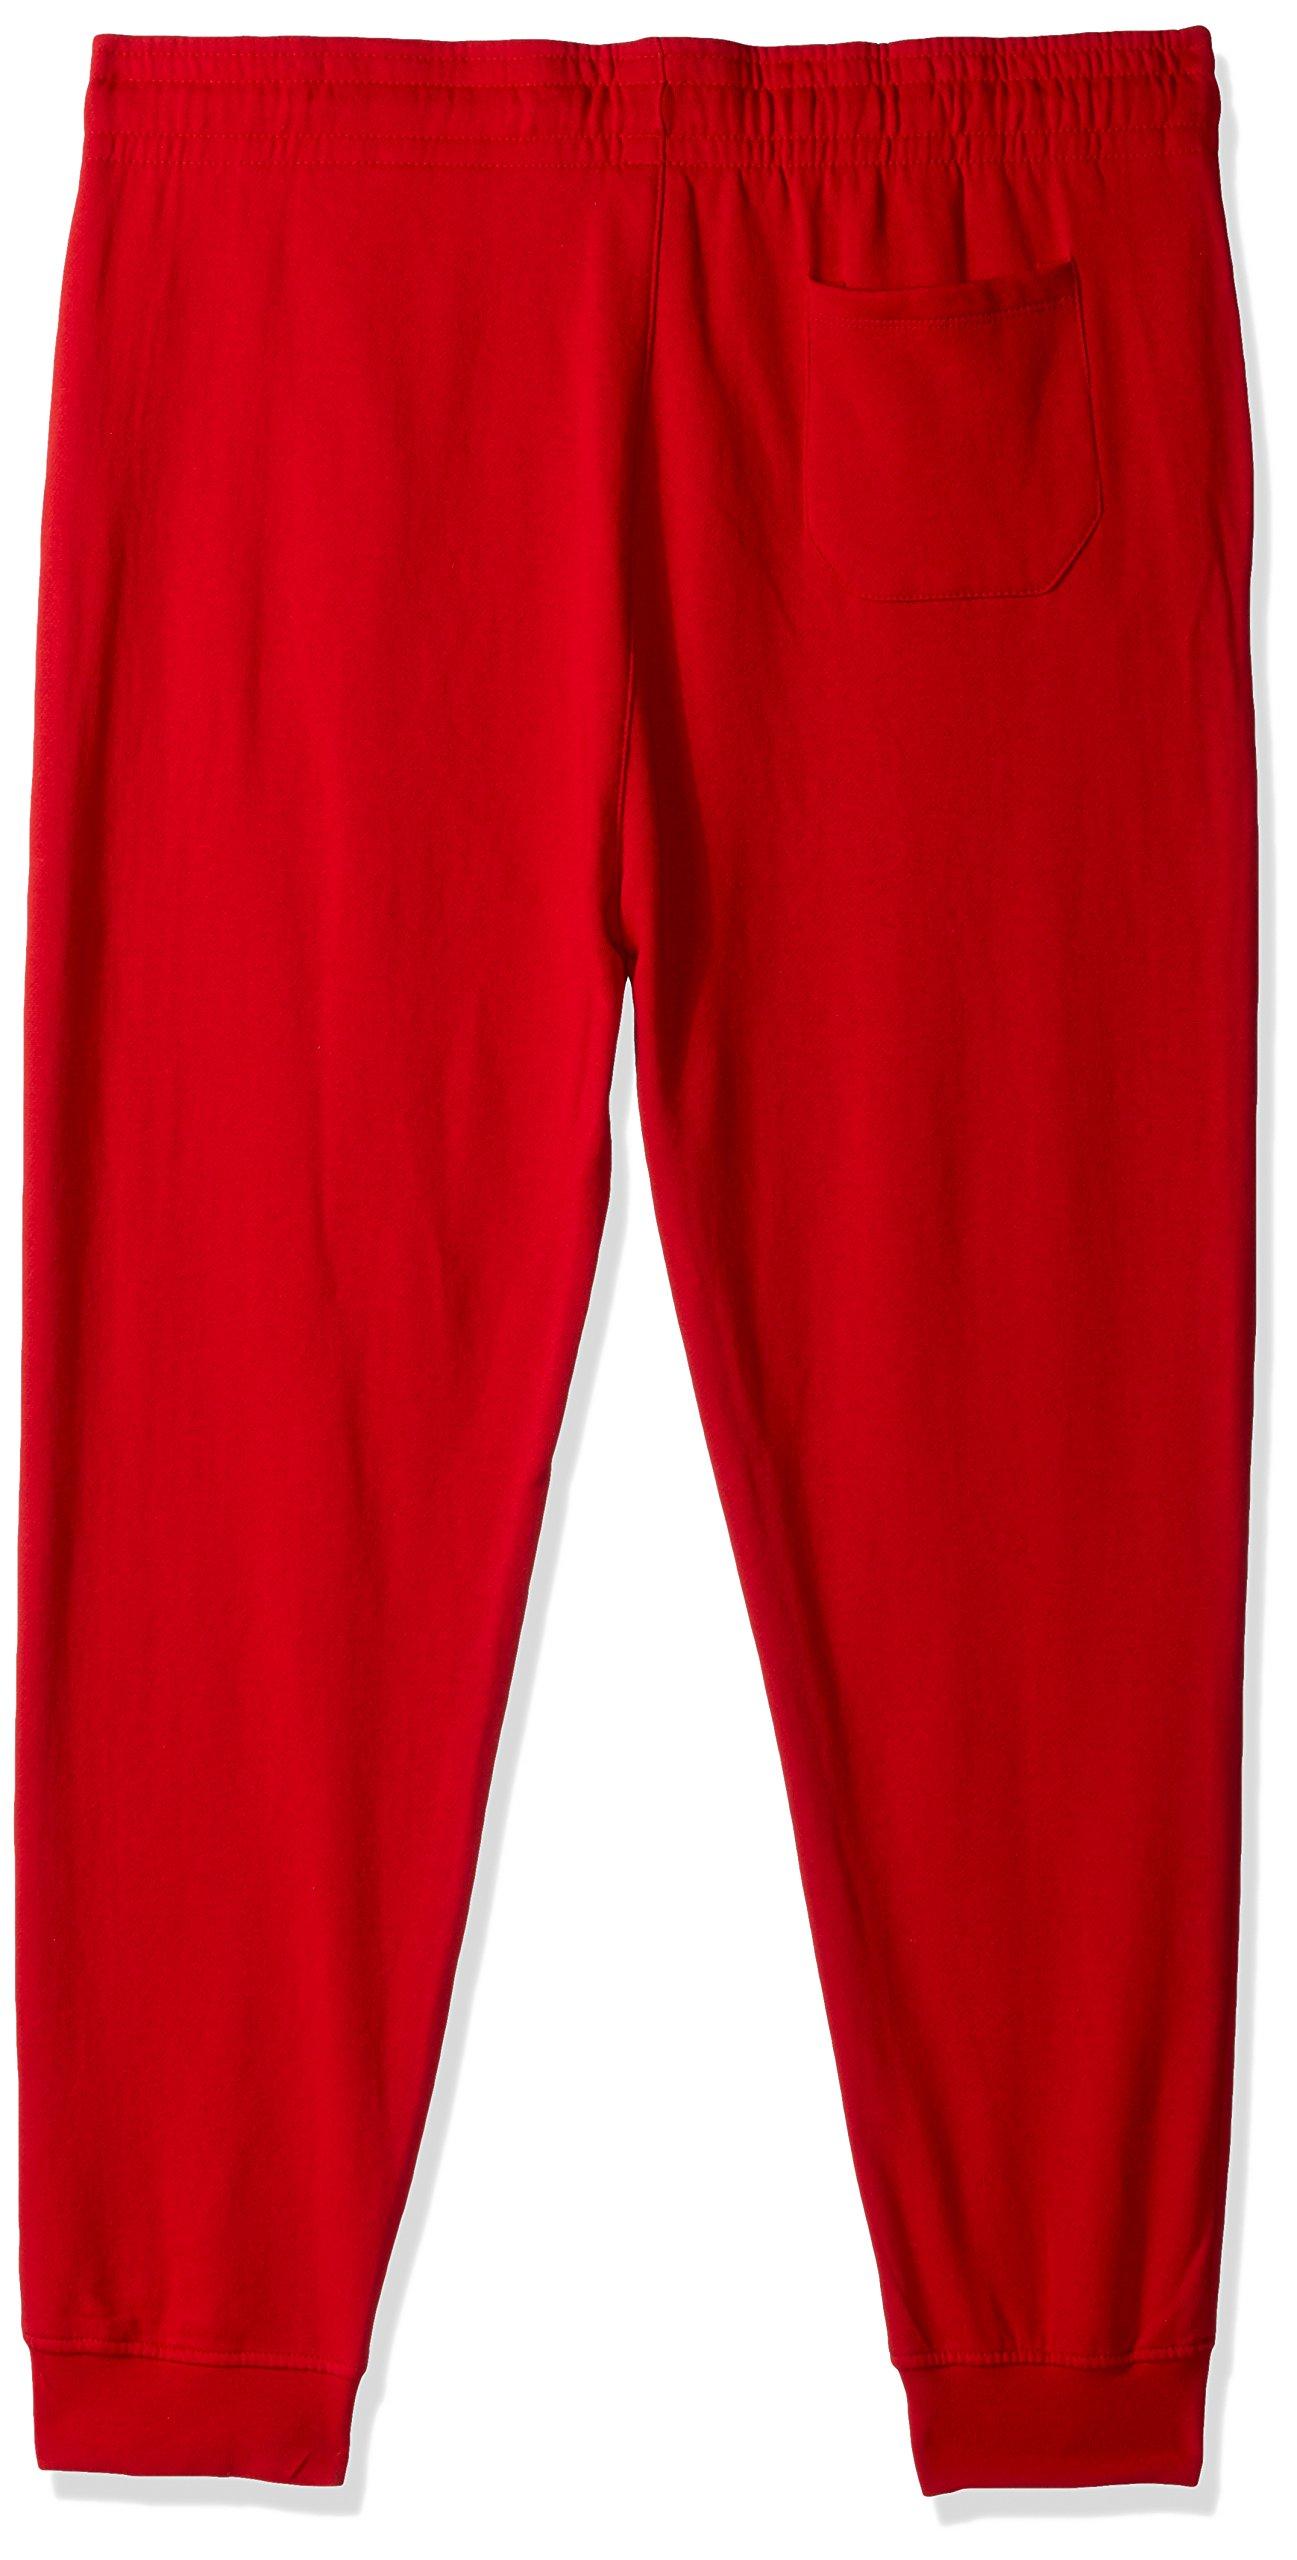 c8efe1326 NBA Chicago Bulls Men s Jogger Pants Active Basic Soft Terry Sweatpants